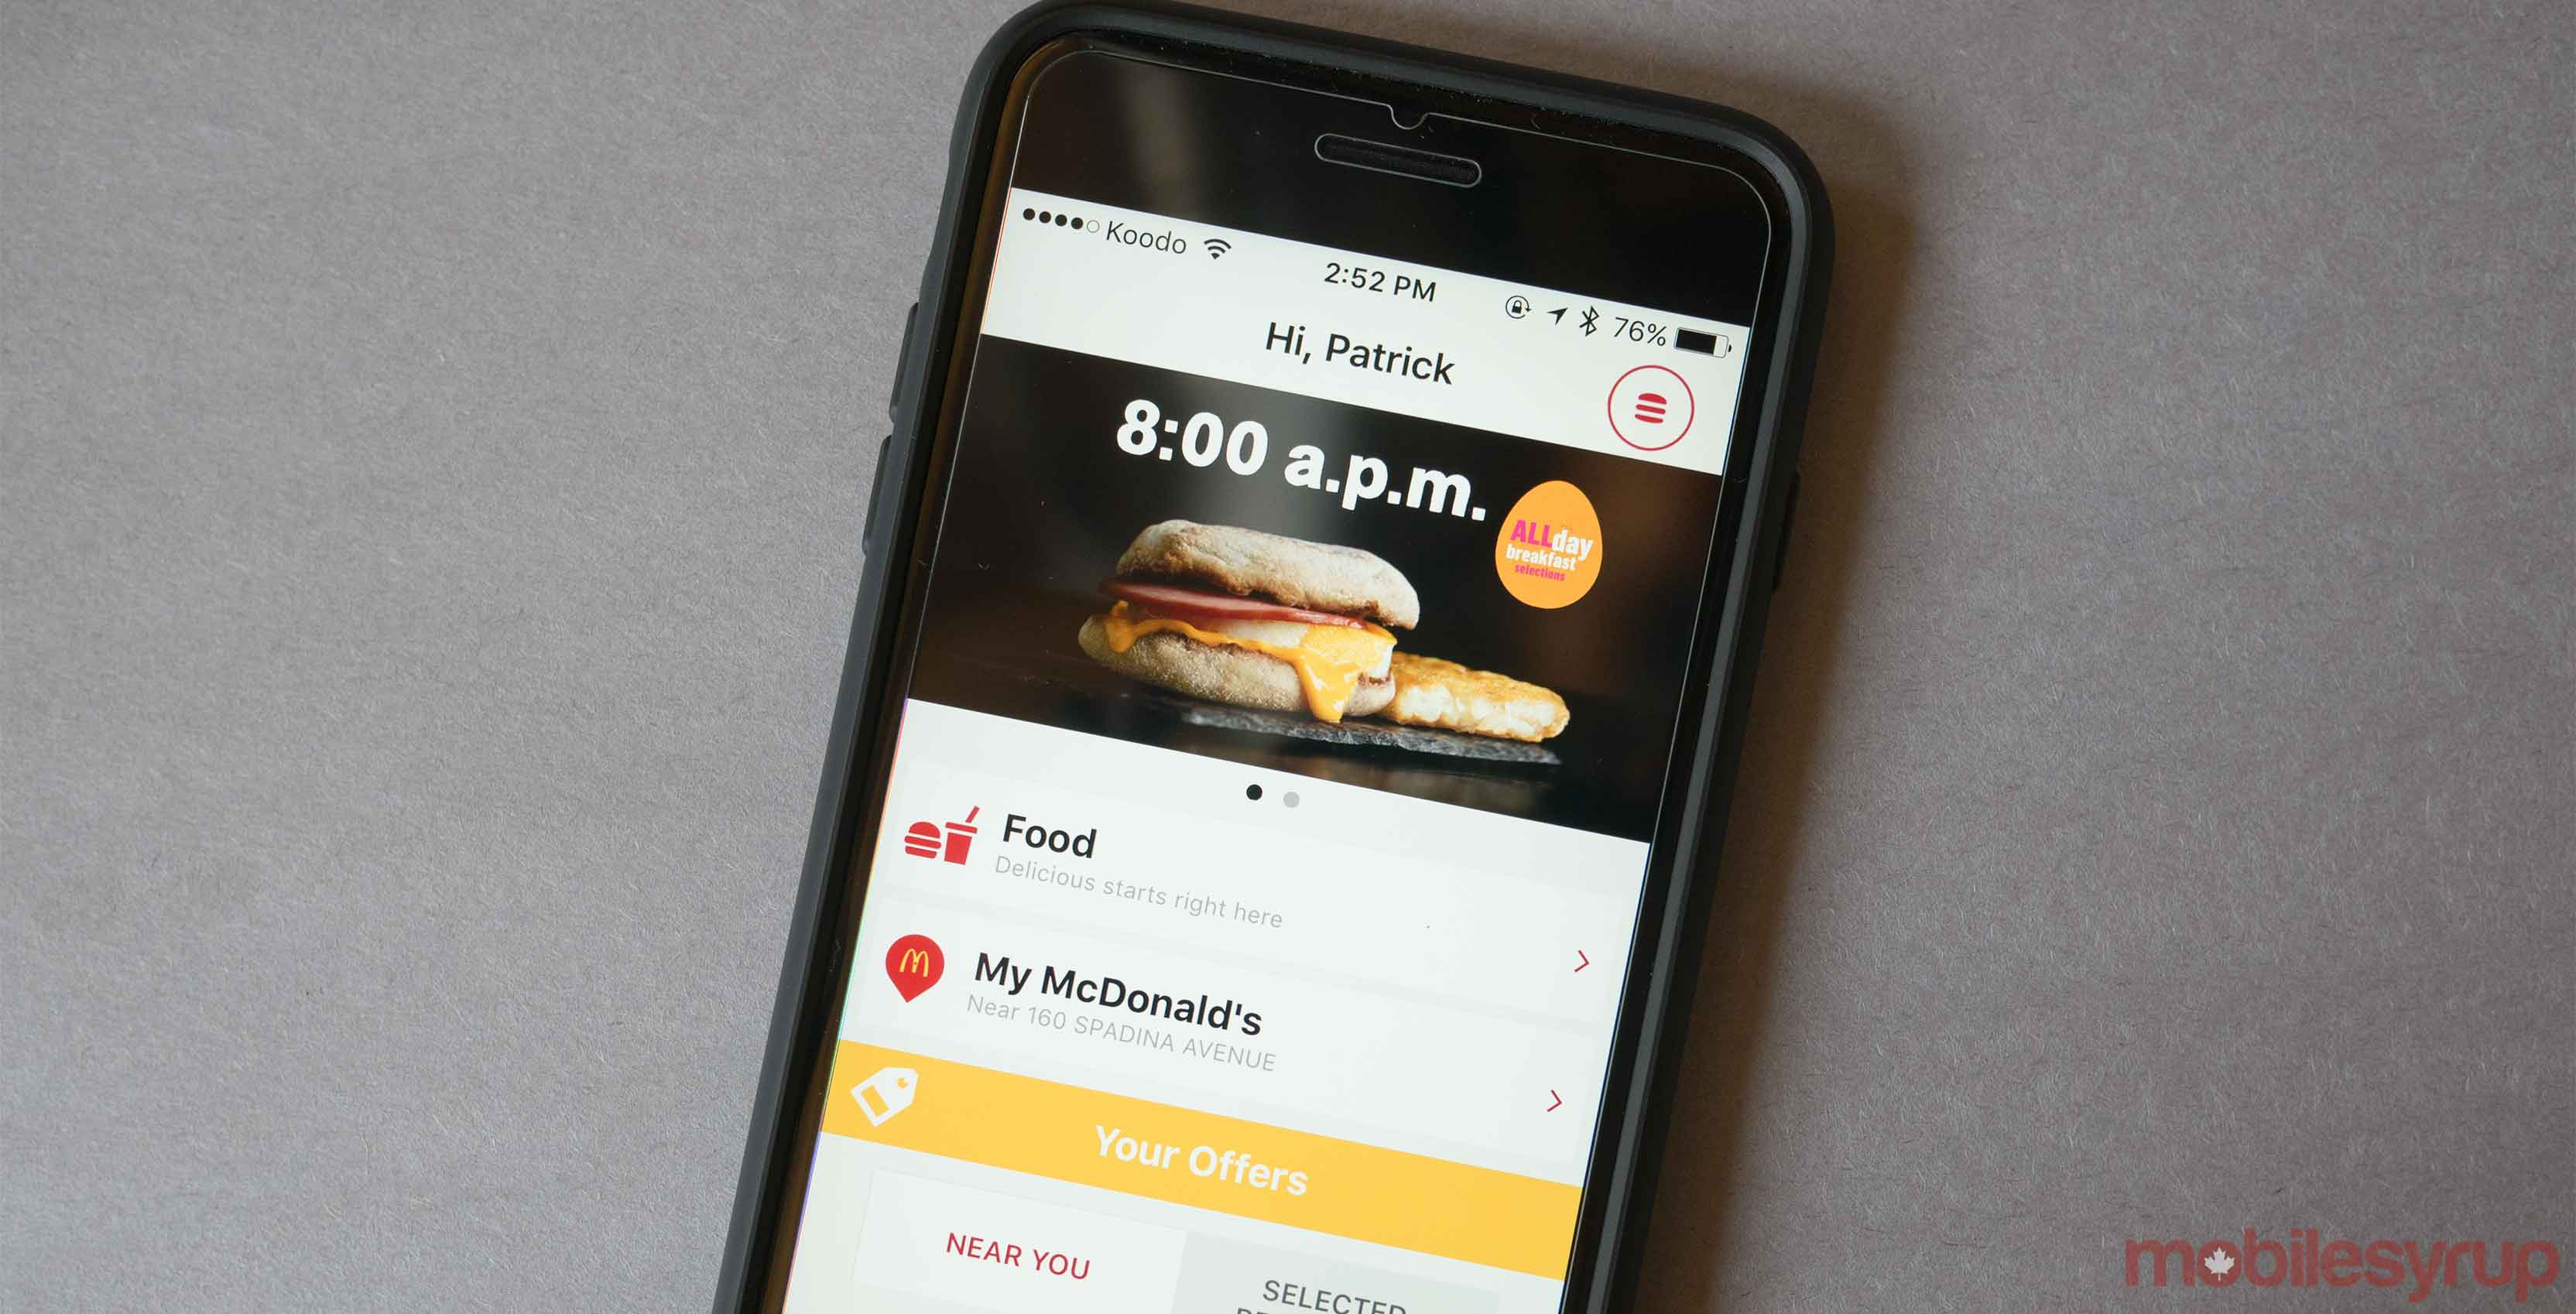 McDonalds mobile app